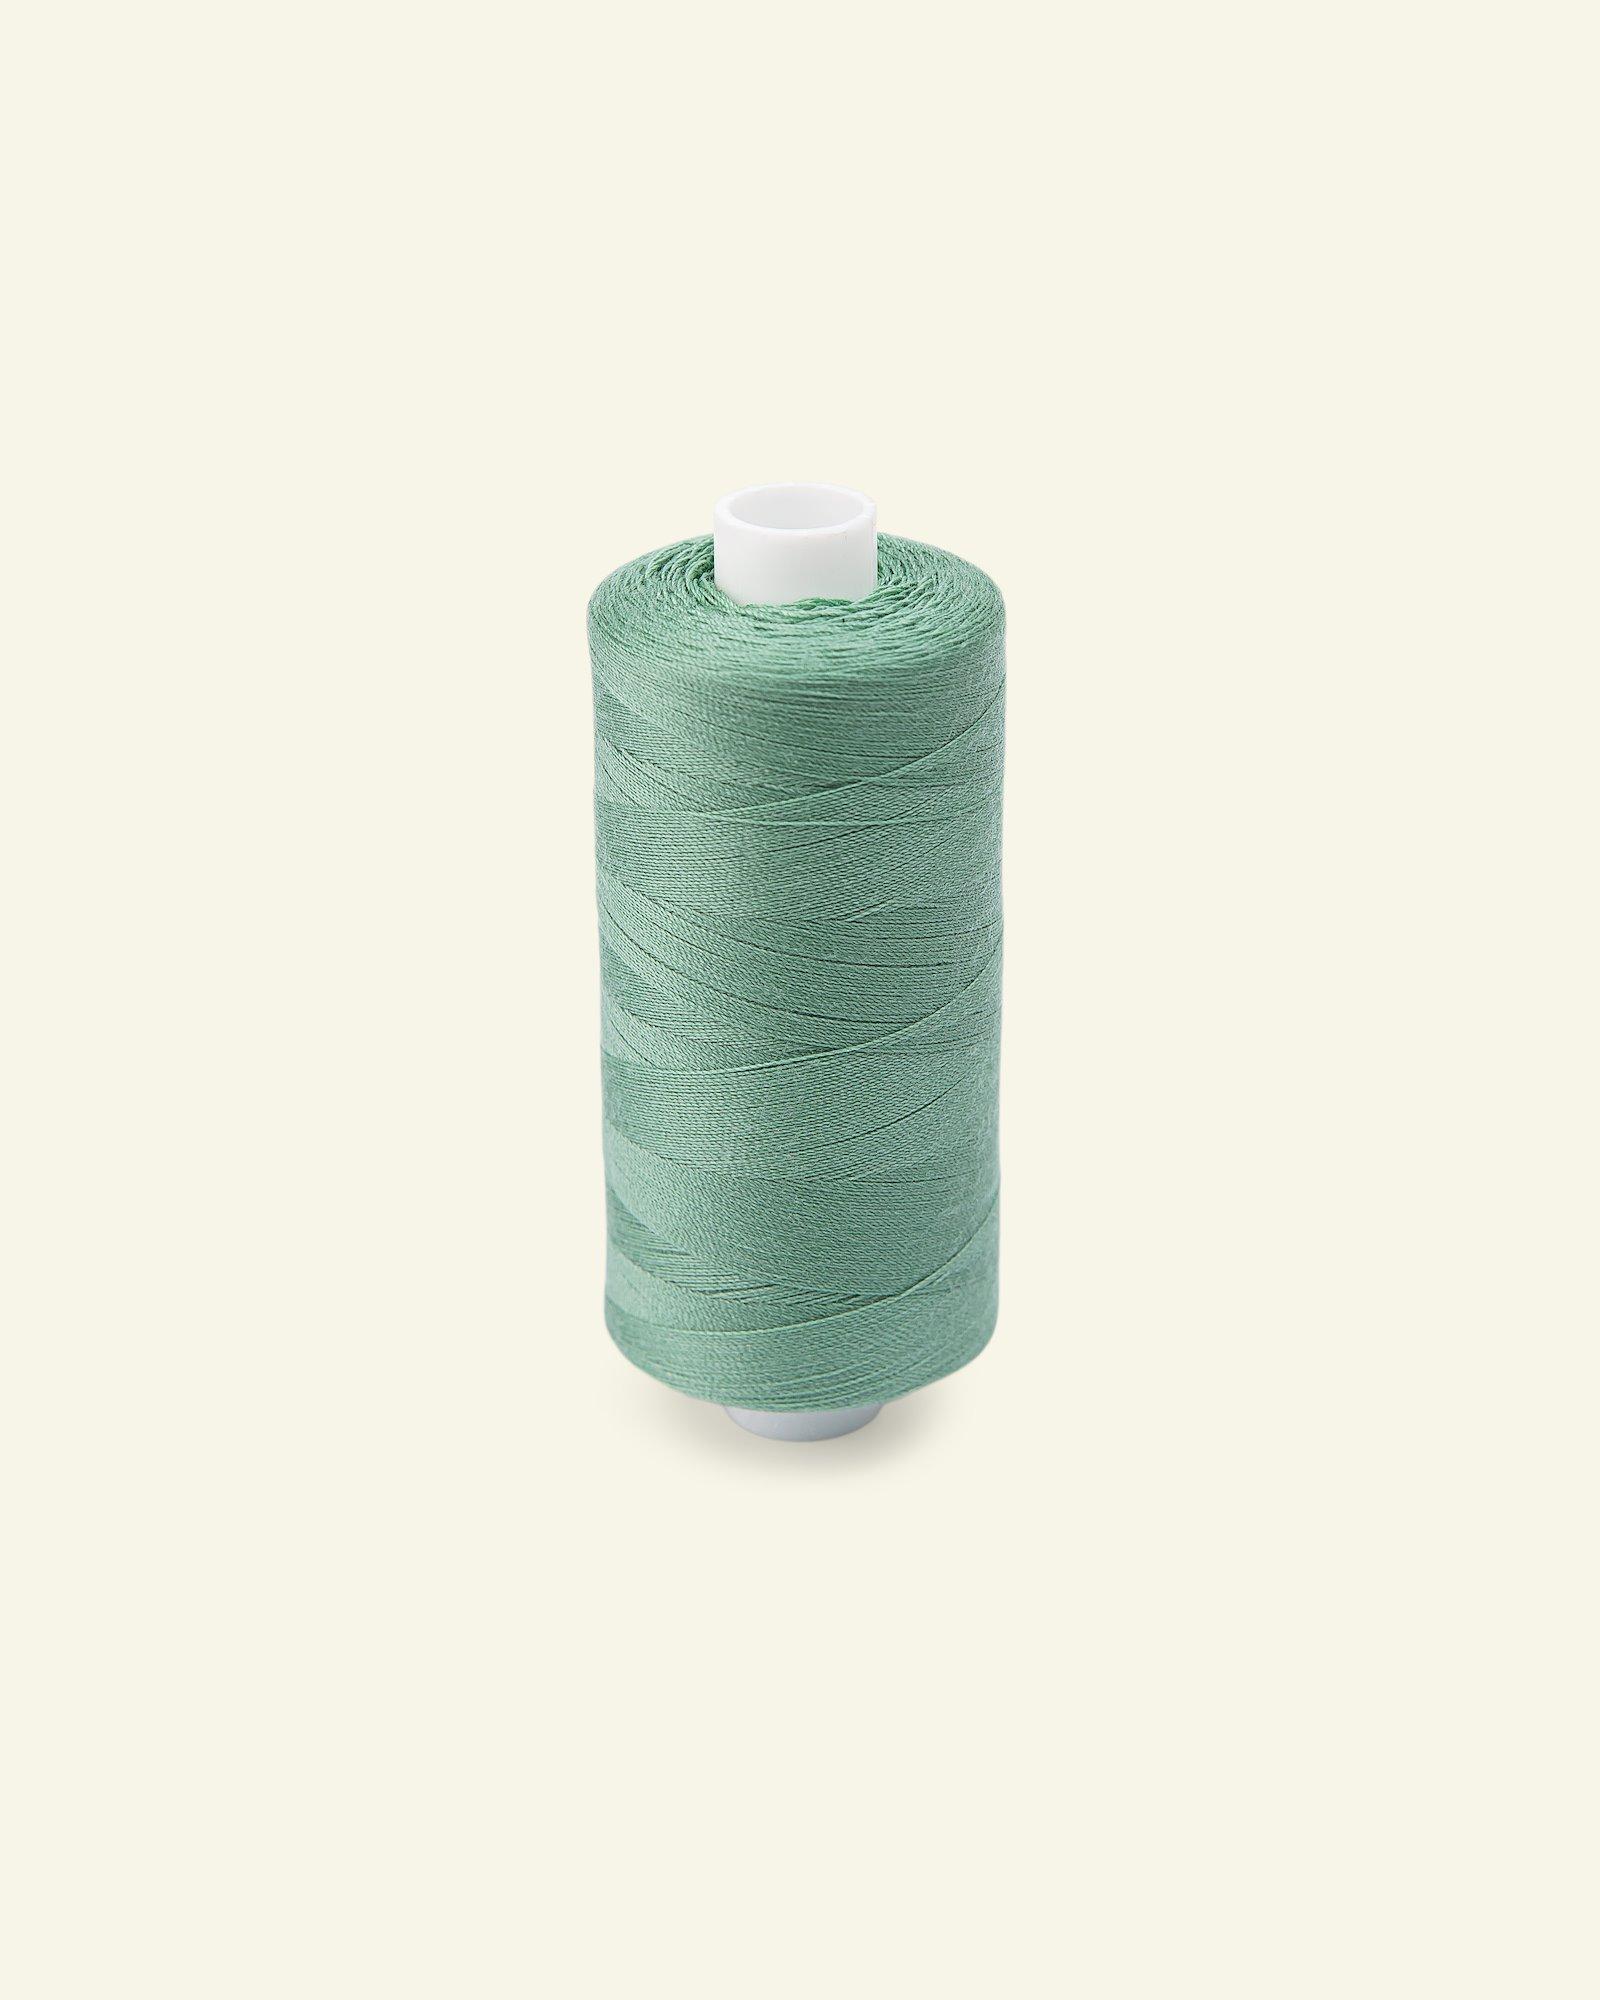 Sewing thread light dusty green 1000m